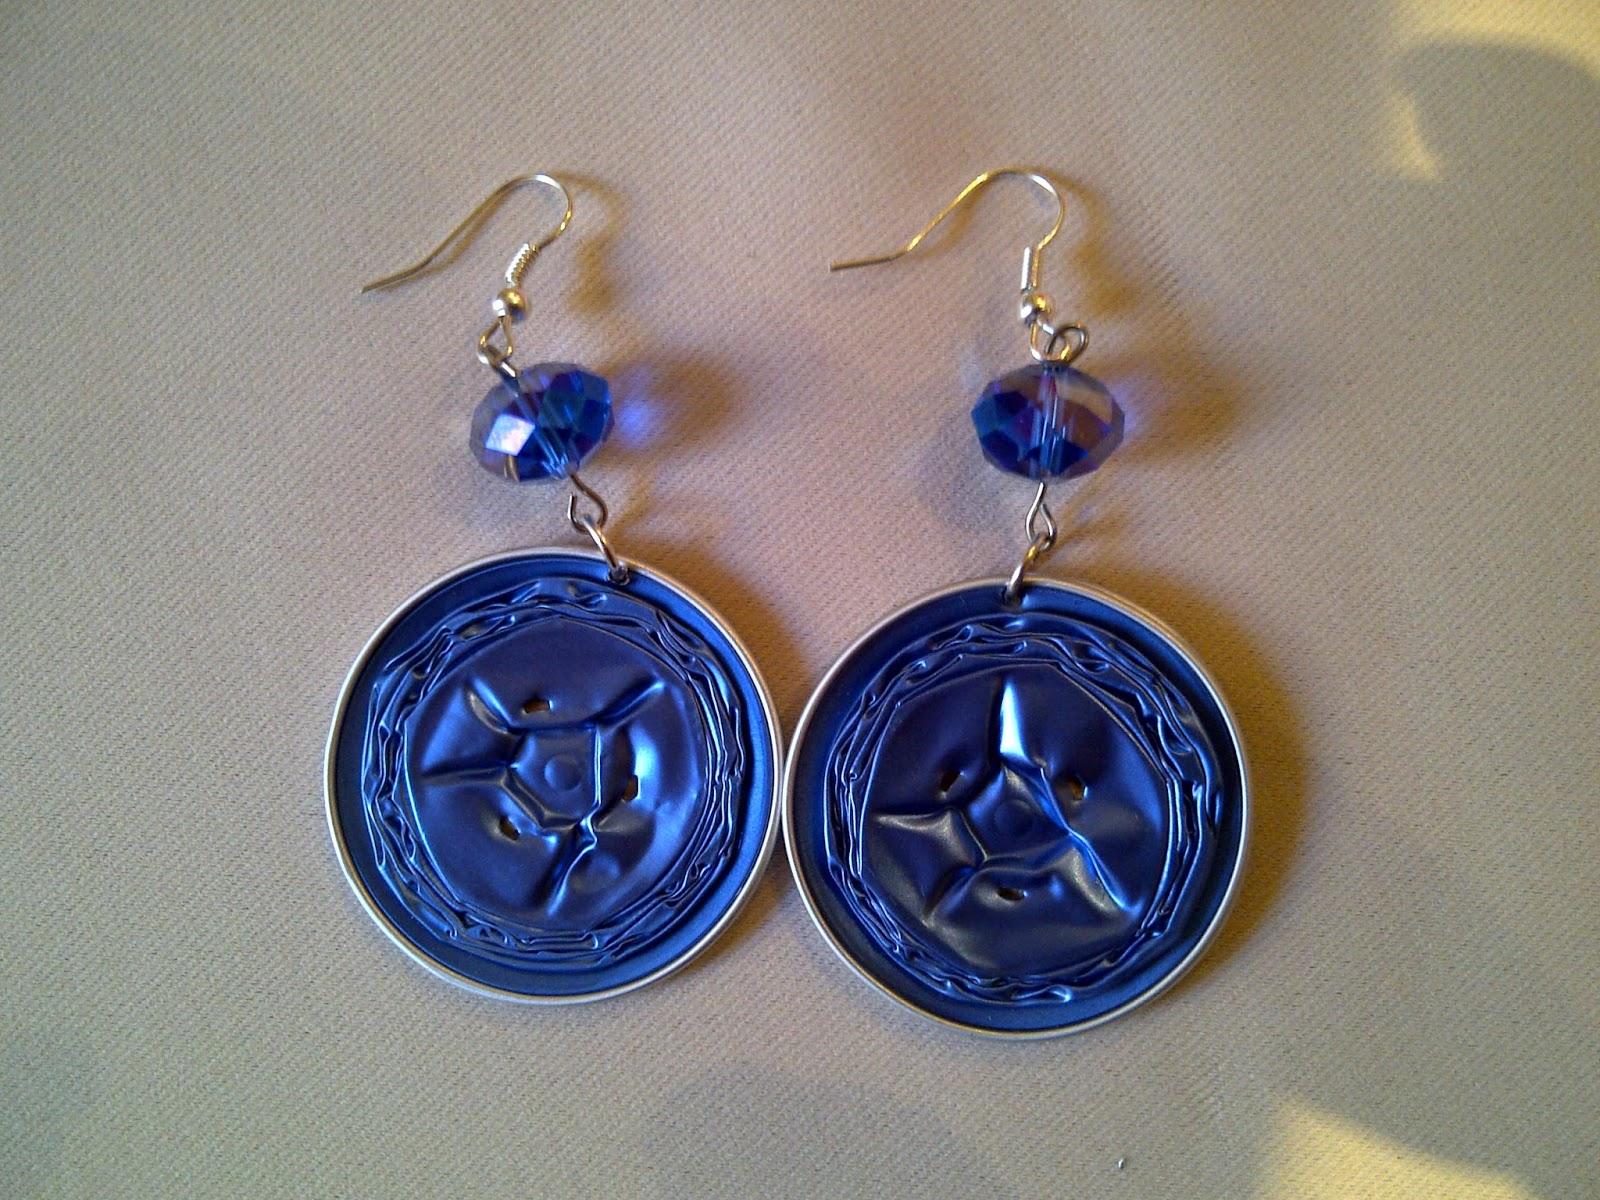 Favorito nespressart bijoux: orecchini FM49